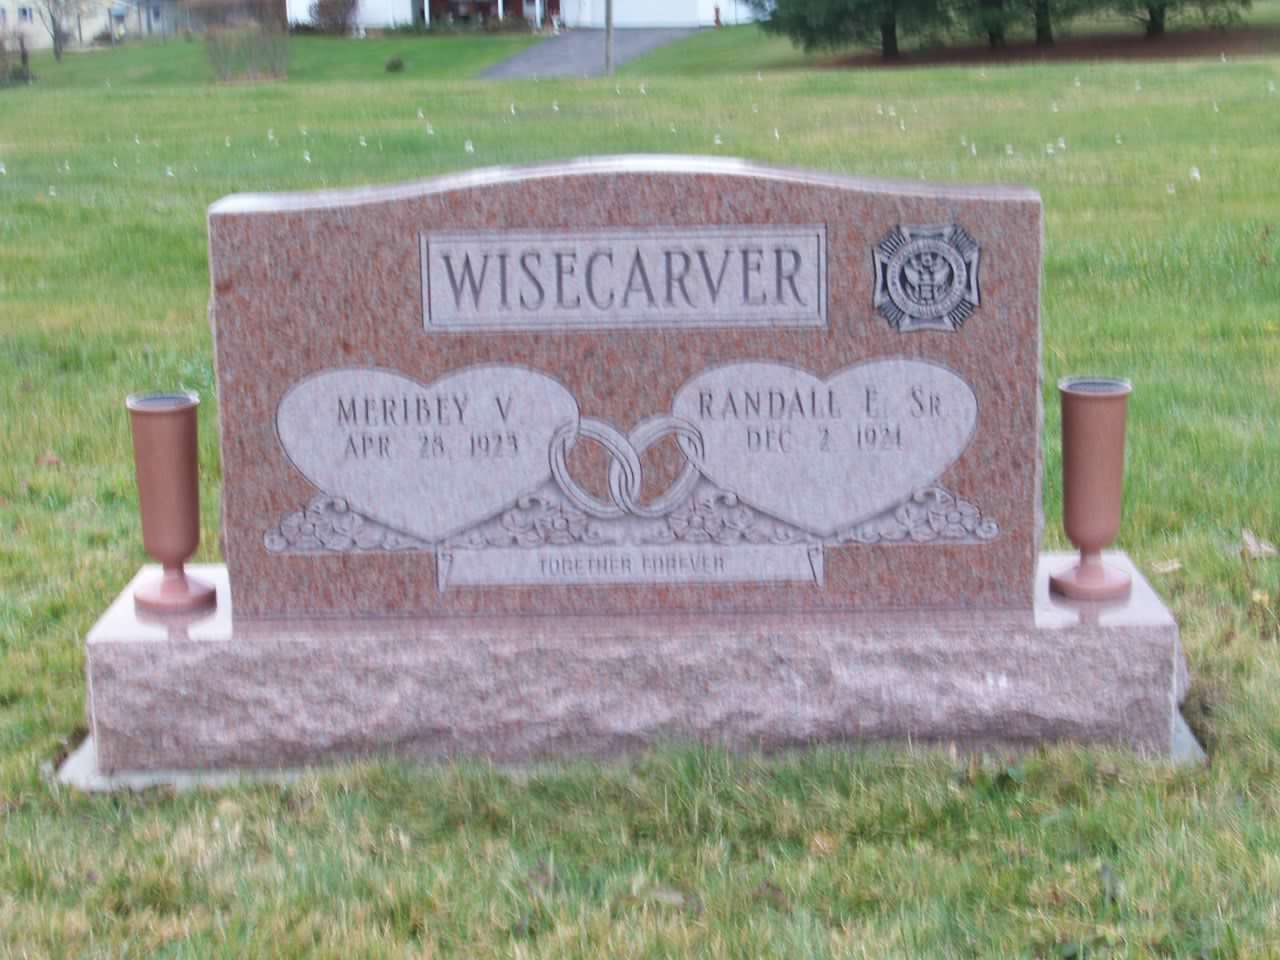 Wisecarver, Merbey, V.